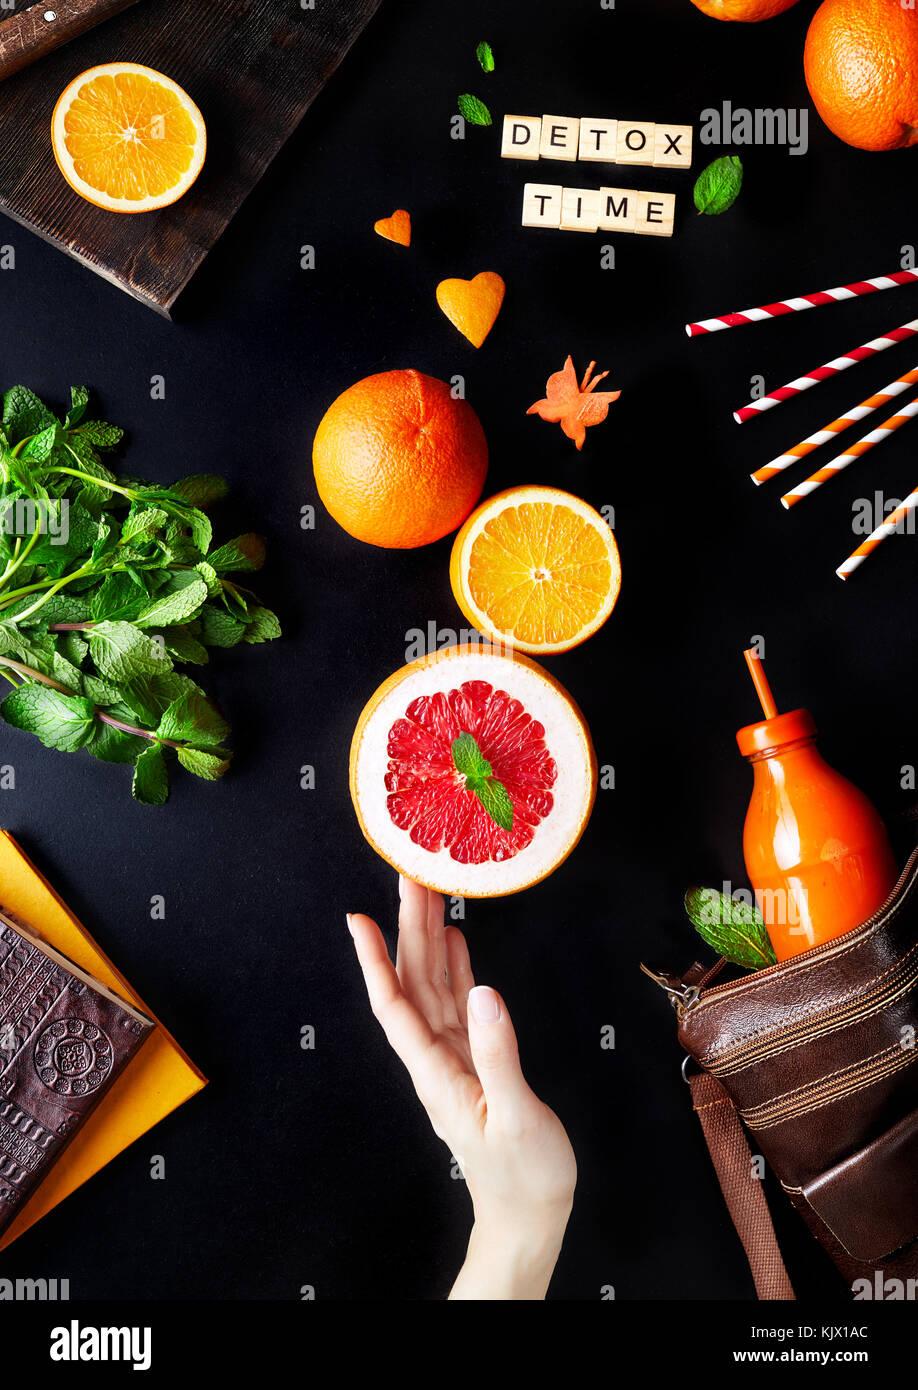 Fresh detox juice from citrus on black background flay lay - Stock Image